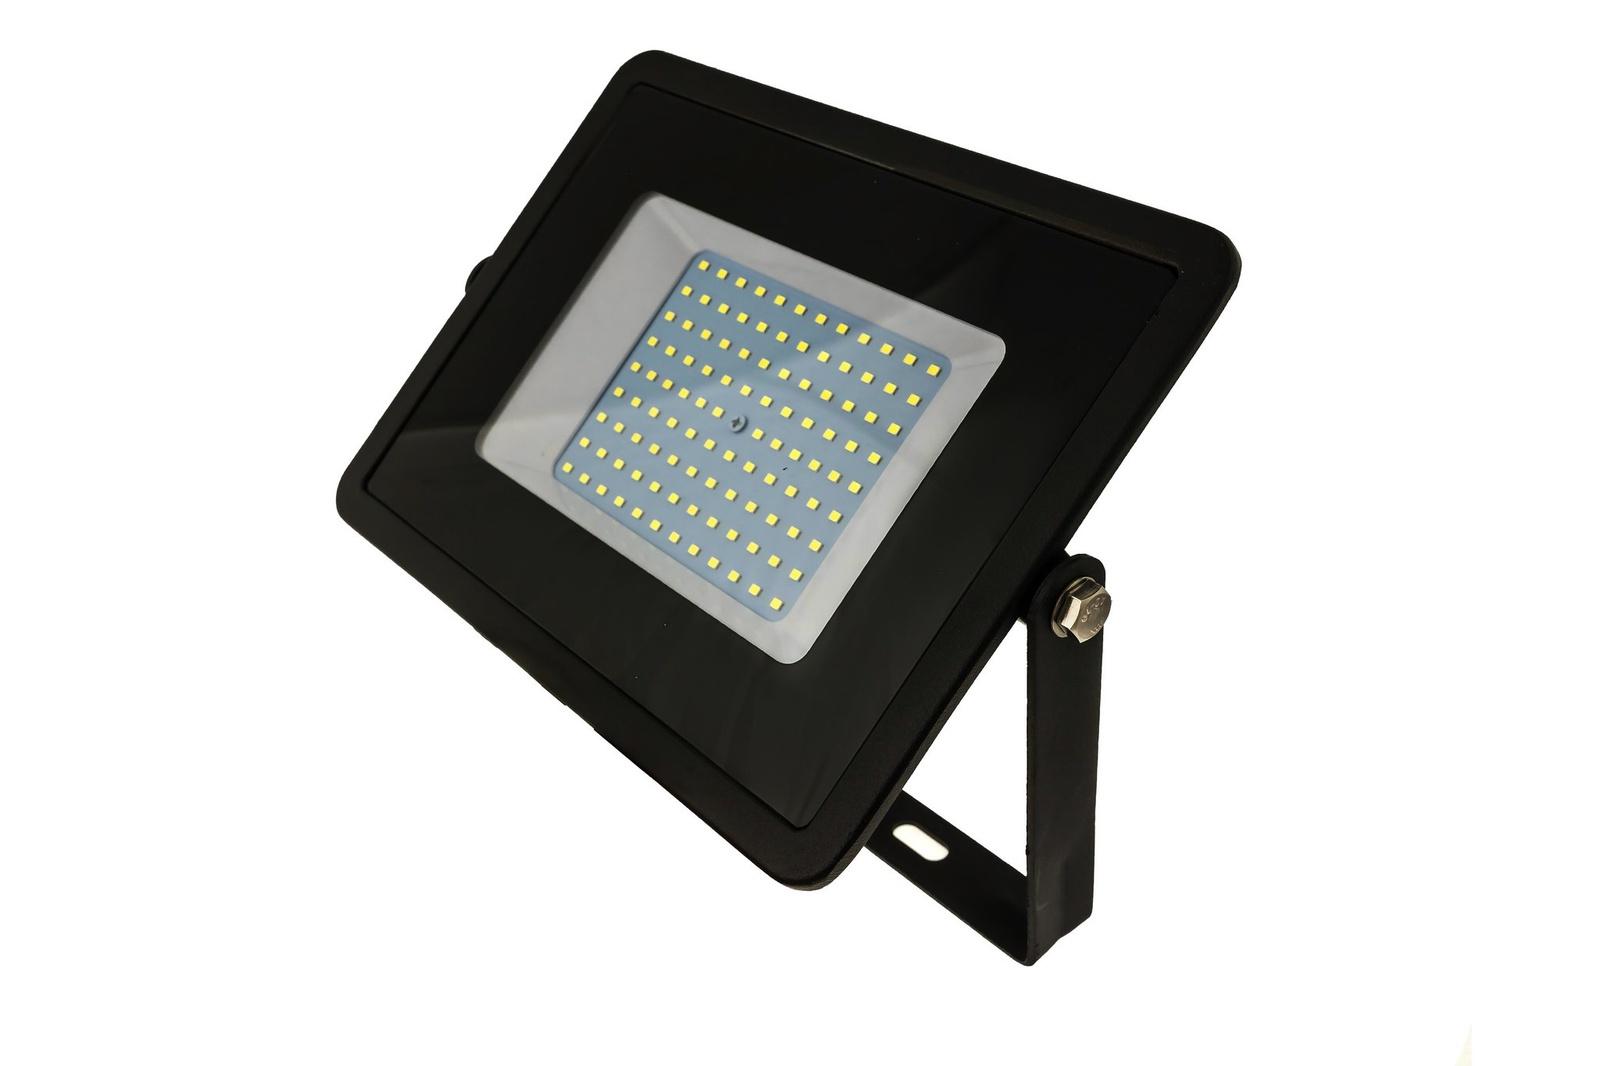 Прожектор Feron Светодиодный LL-922 системный блок hp 290 g1 mt intel core i3 intel core i3 7100 4 гб ssd 128 гб intel hd graphics 630 windows 10 pro